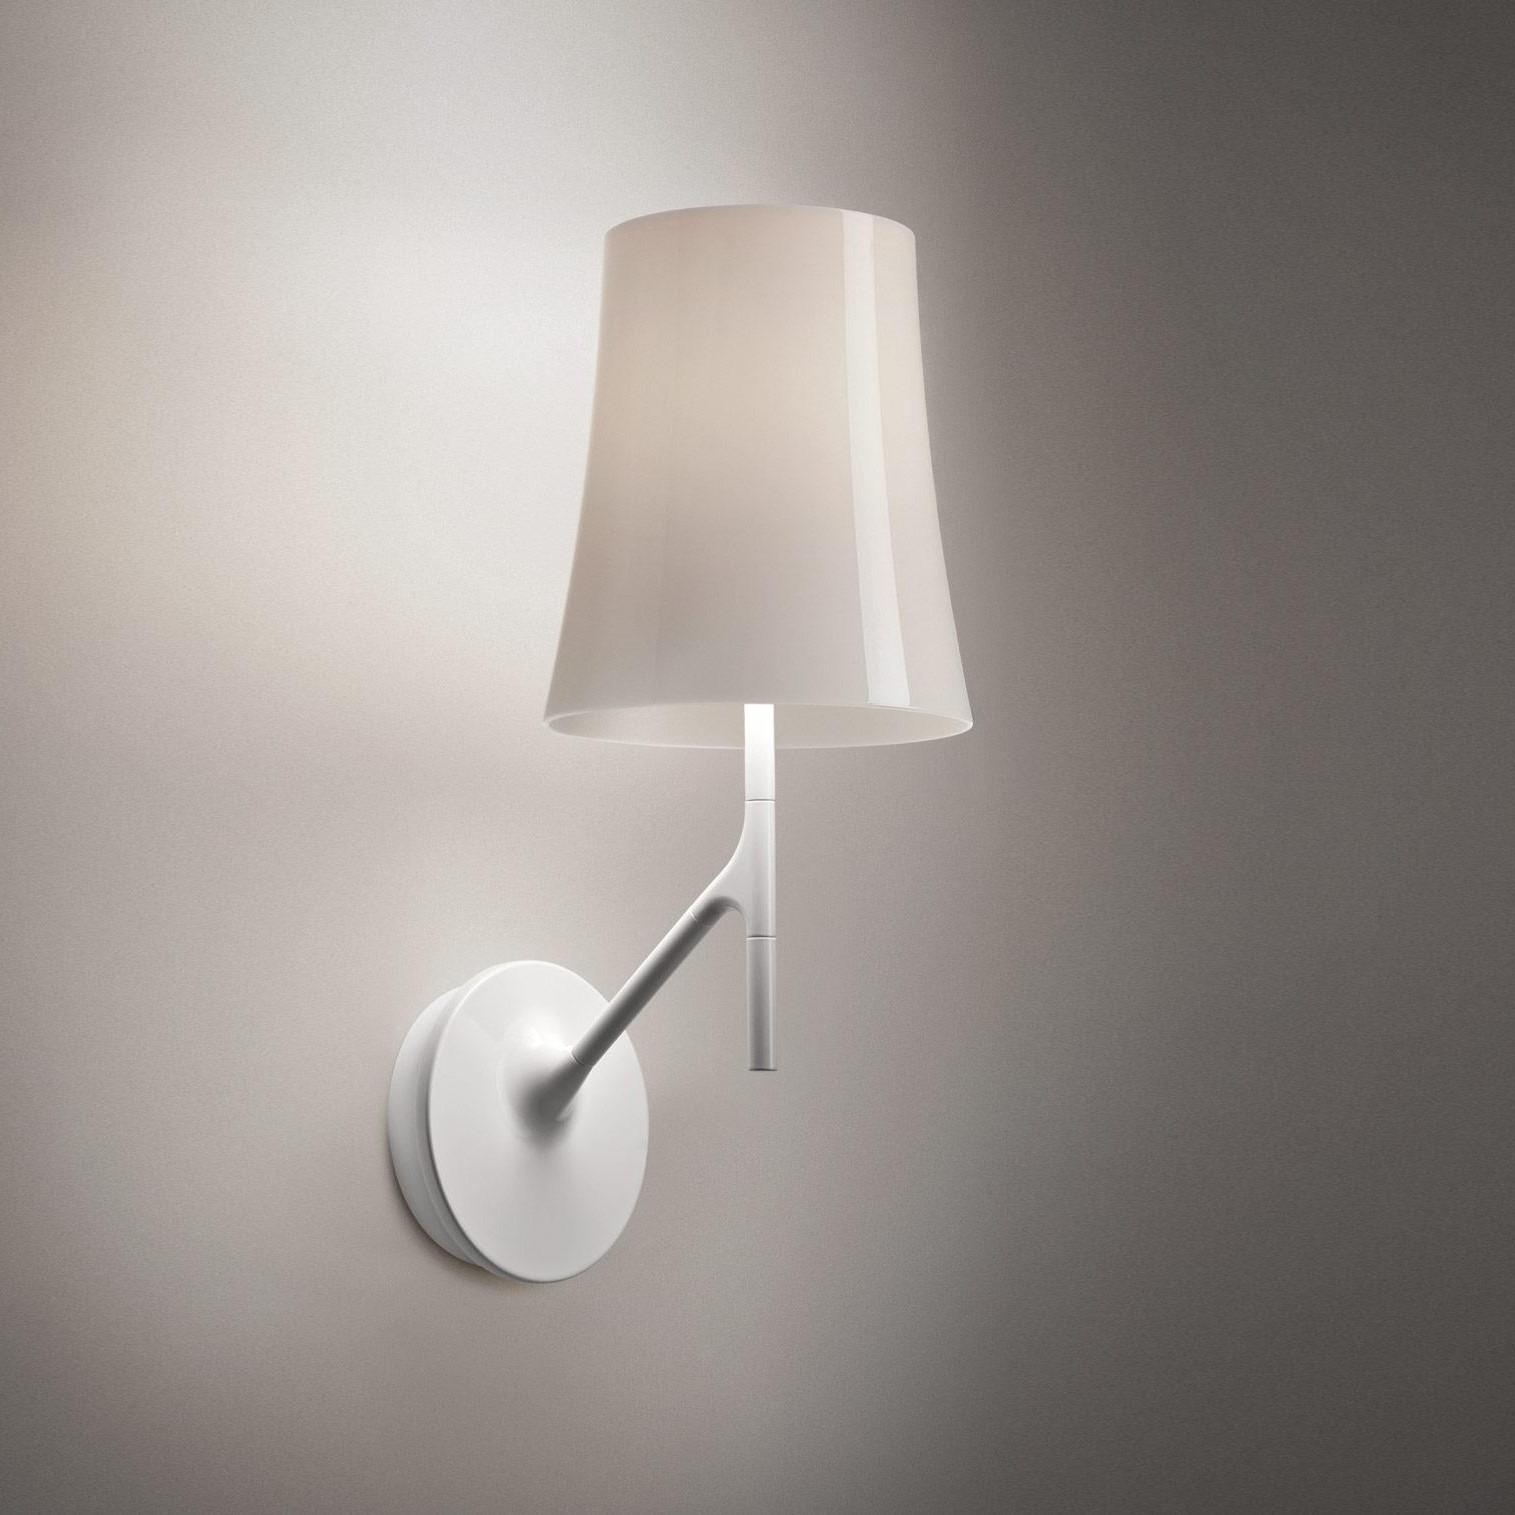 Foscarini Bir Wall Lamp Ambientedirect